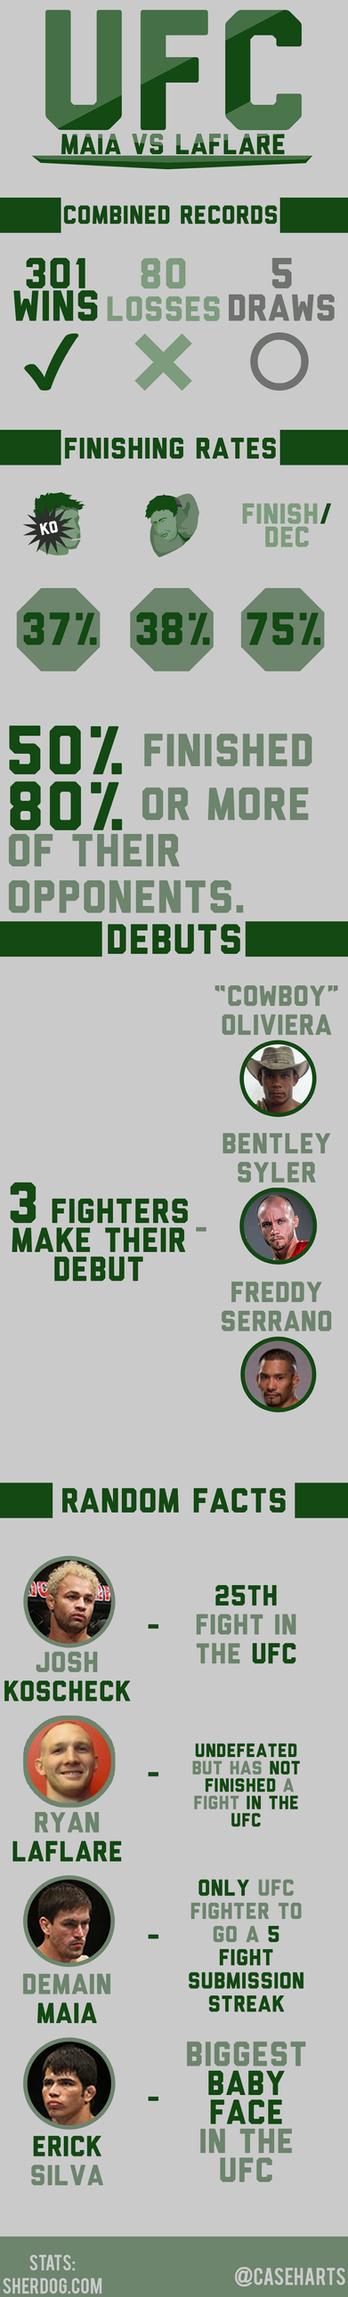 UFC FN Maia vs LaFlare graphic by caseharts